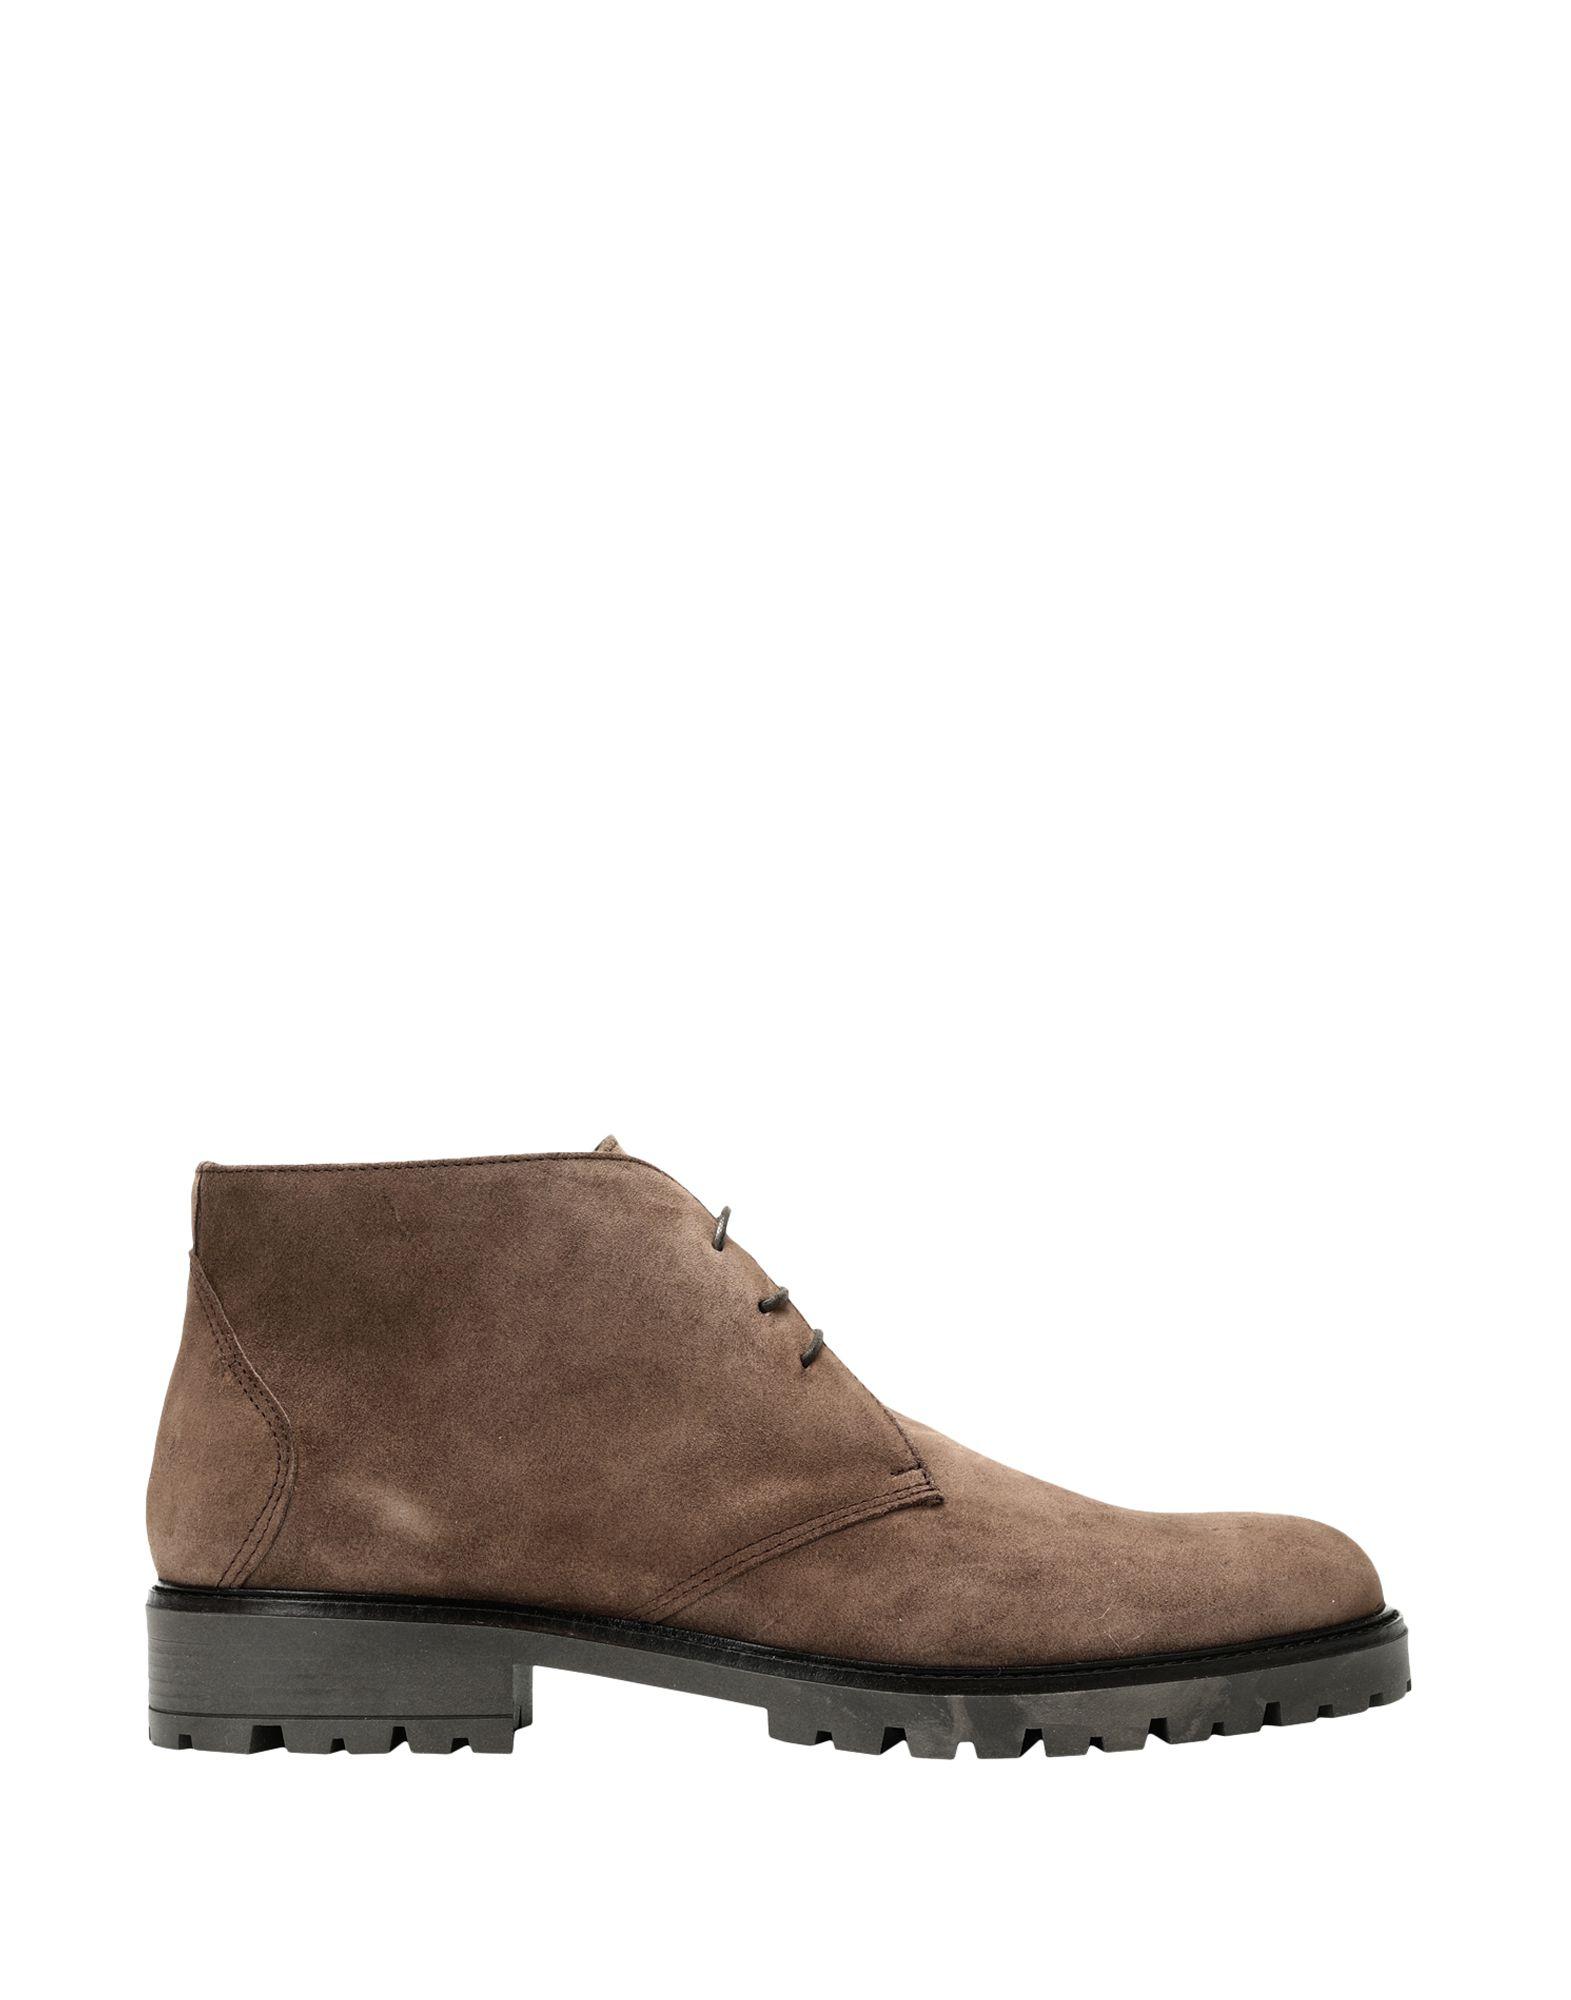 8 by YOOX Полусапоги и высокие ботинки studio by volpato ботинки